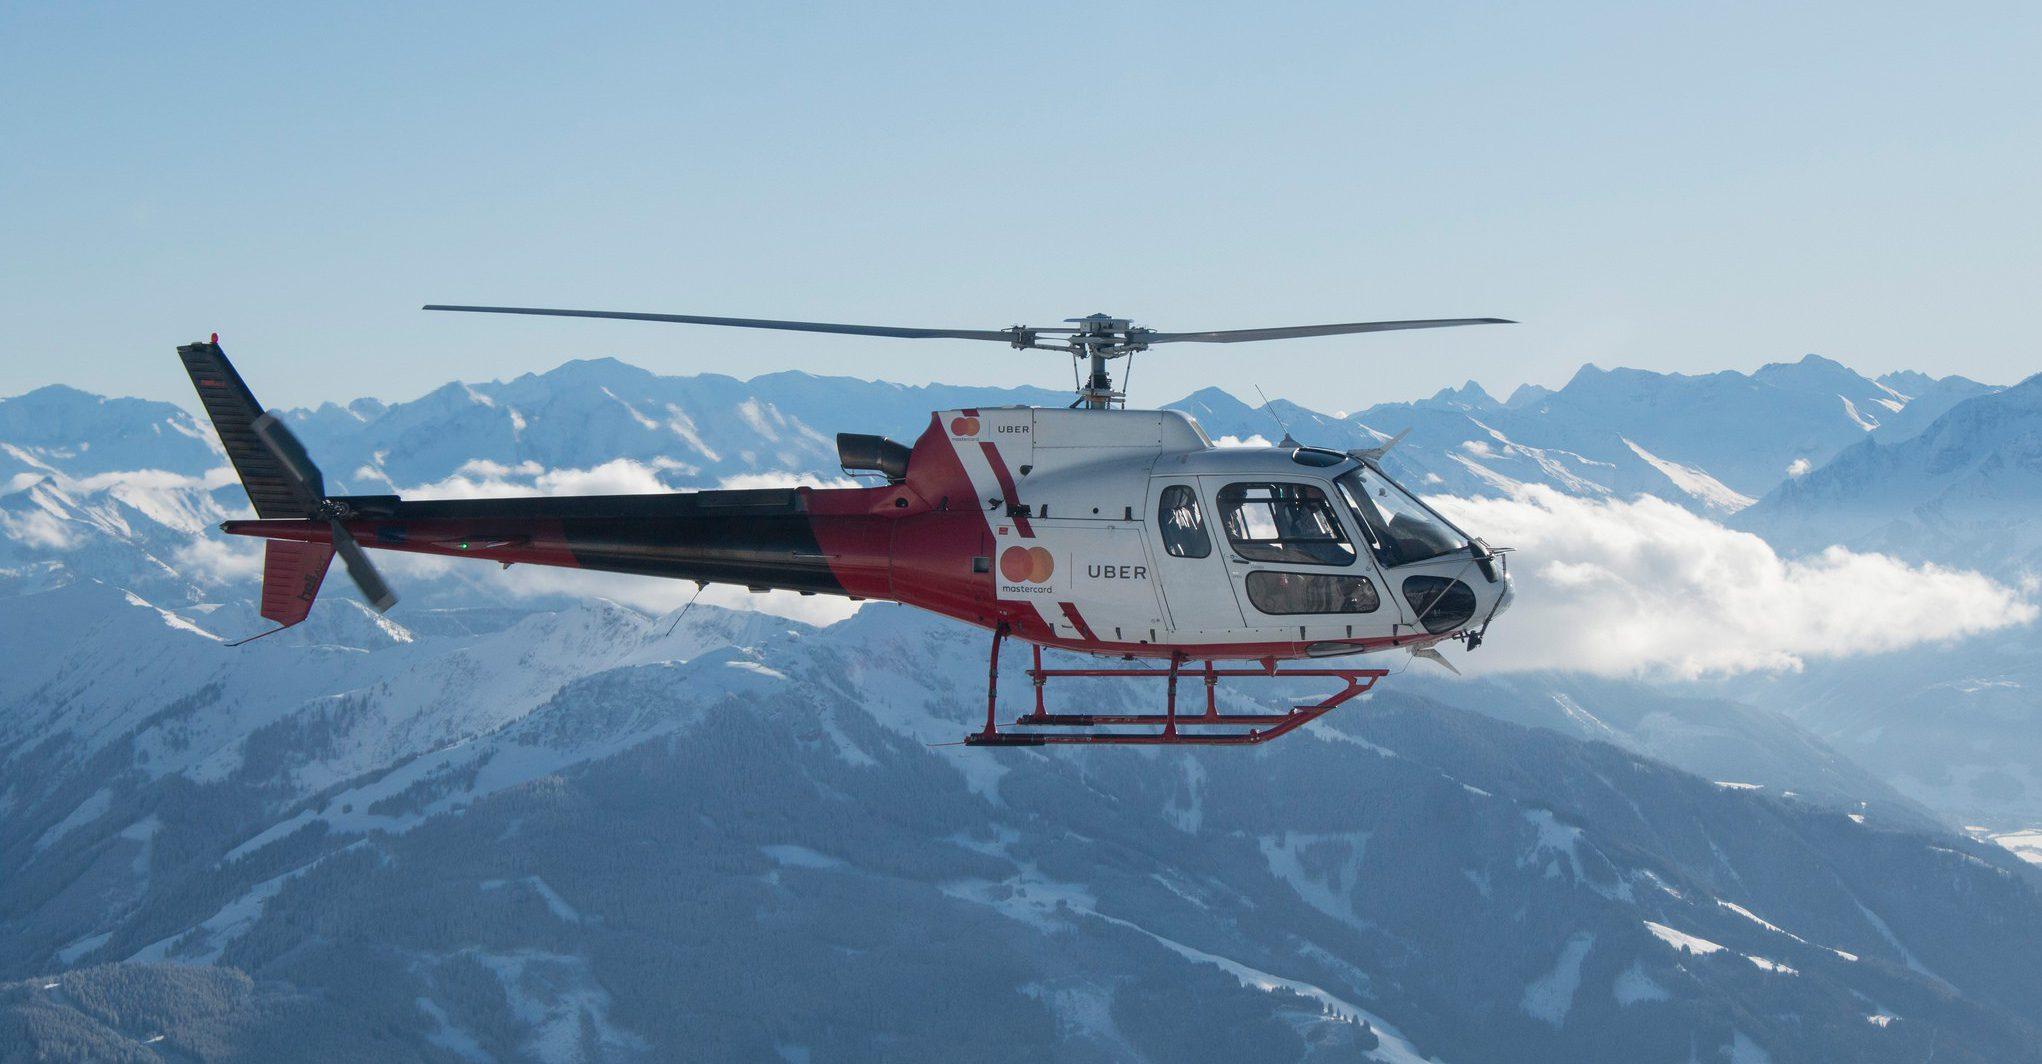 UberHELI Helikopter Service Bei Hahnenkamm Rennen